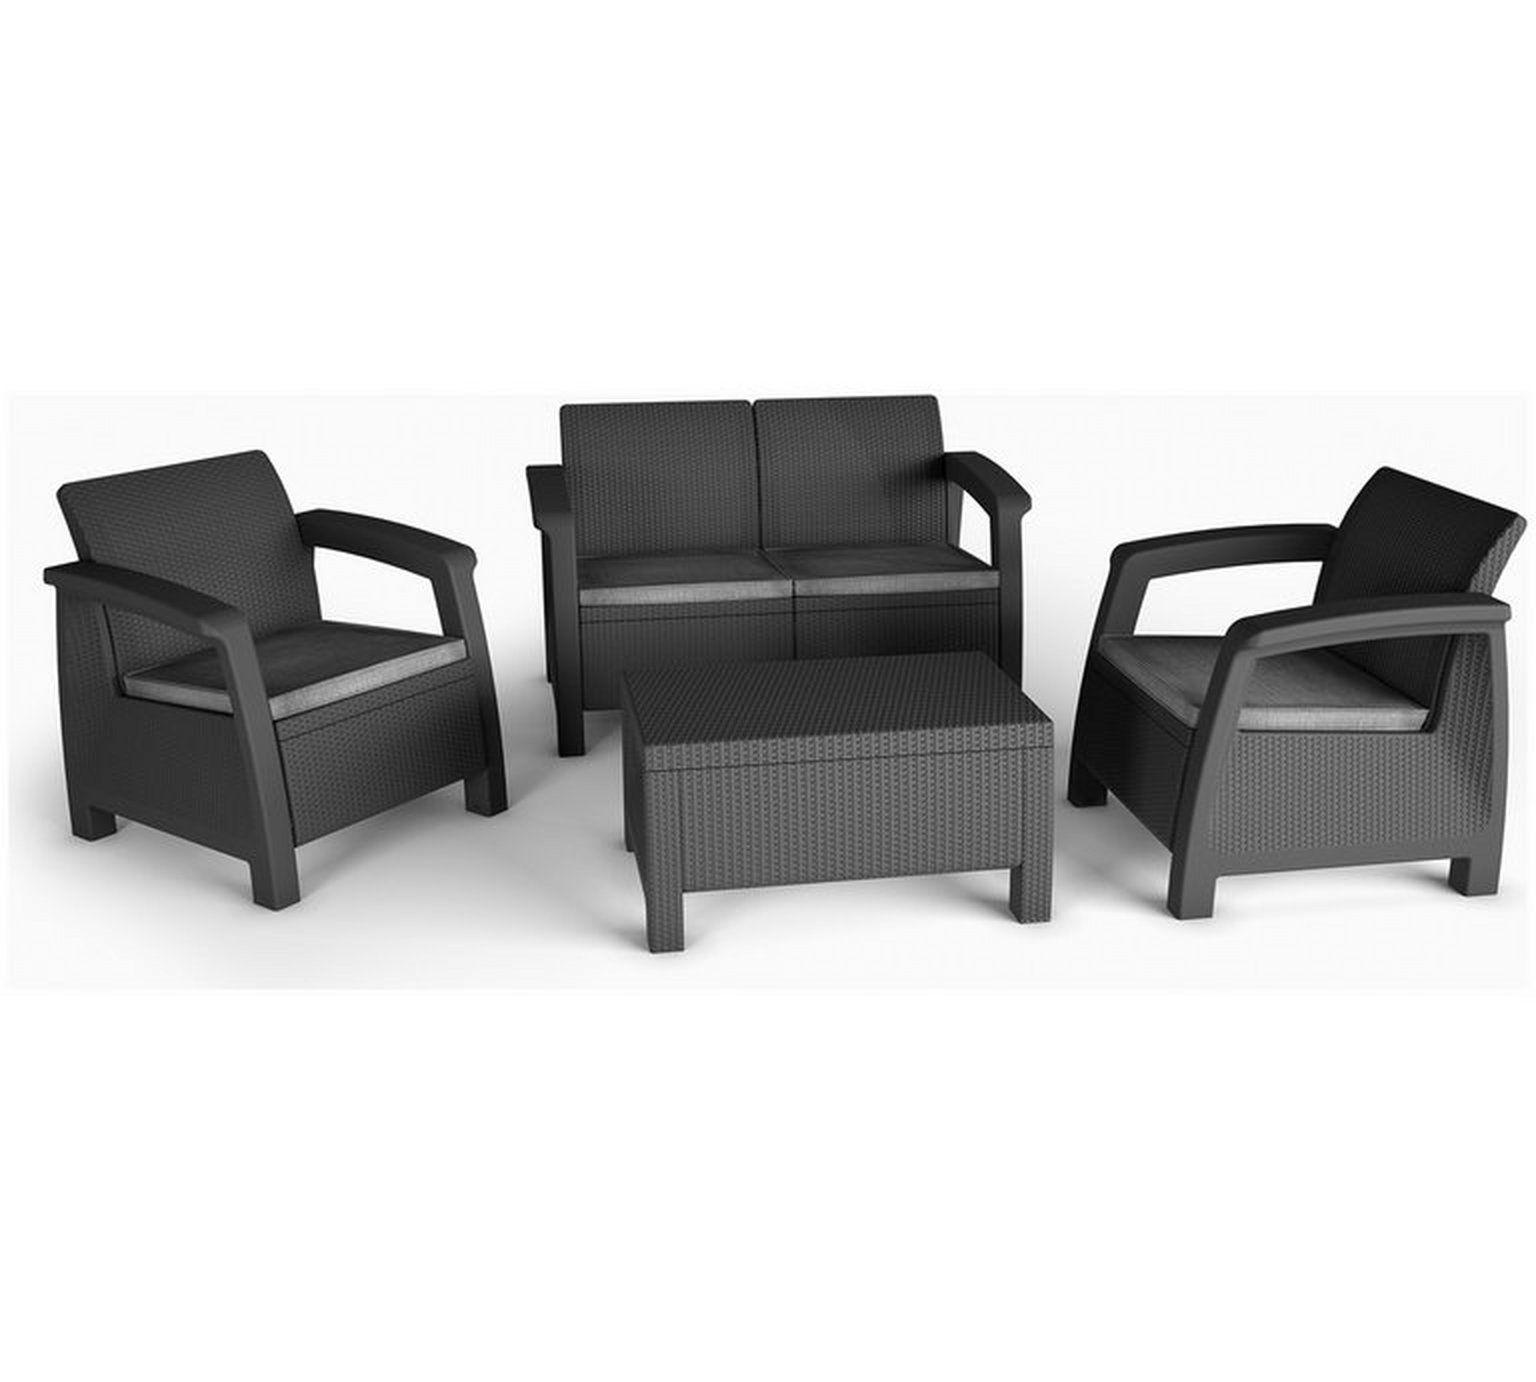 Buy Keter Bahamas Rattan 4 Seater Garden Lounge Set ... serapportantà Salon De Jardin Keter